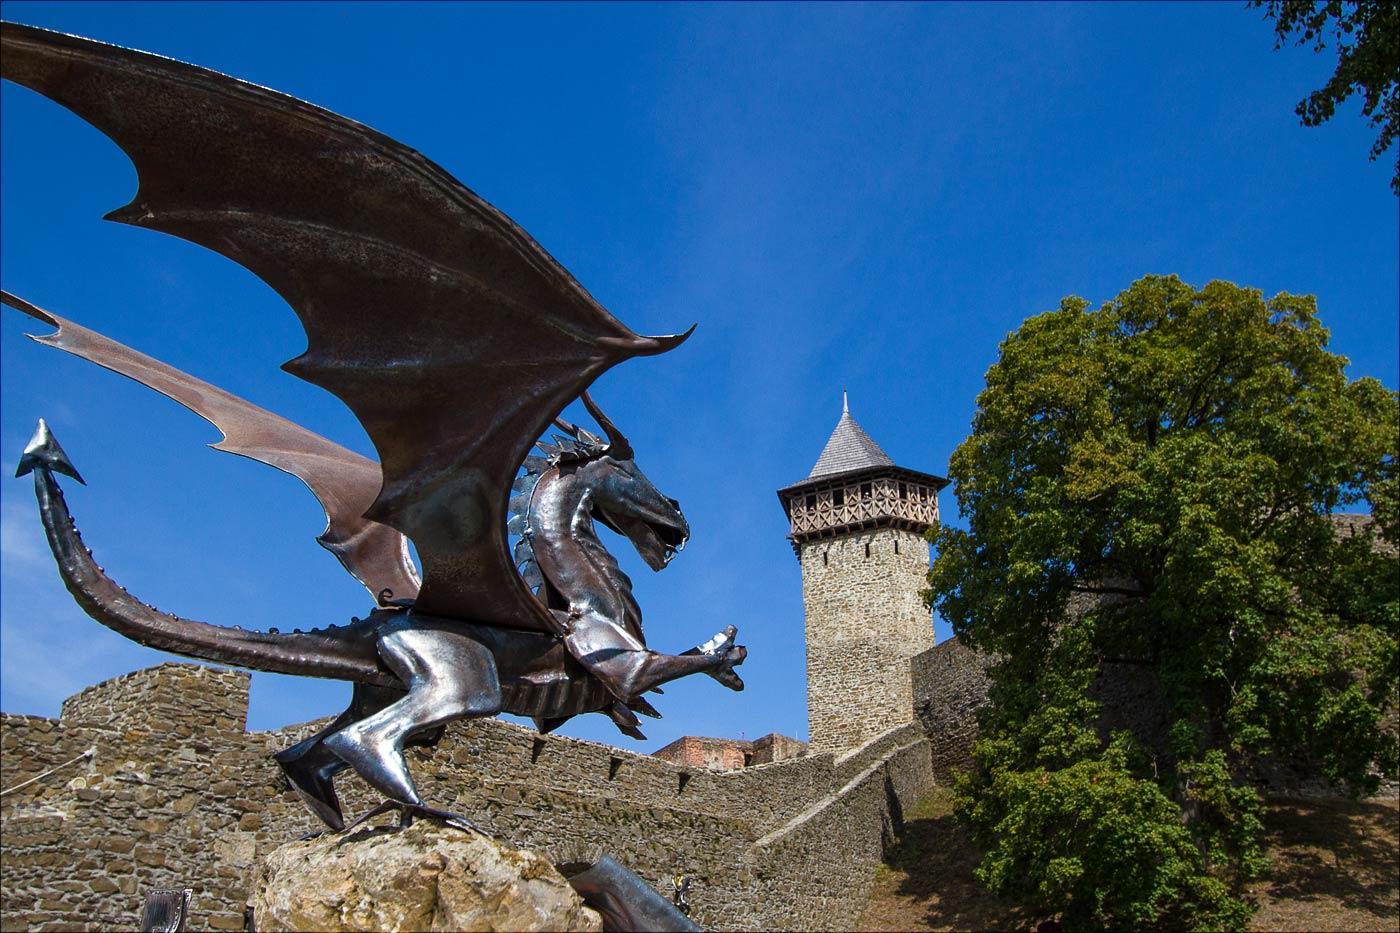 http://countryczech.com/wp-content/uploads/2015/09/photos/20150828-130925_Moravia_Hrad_Helfstyn.jpg